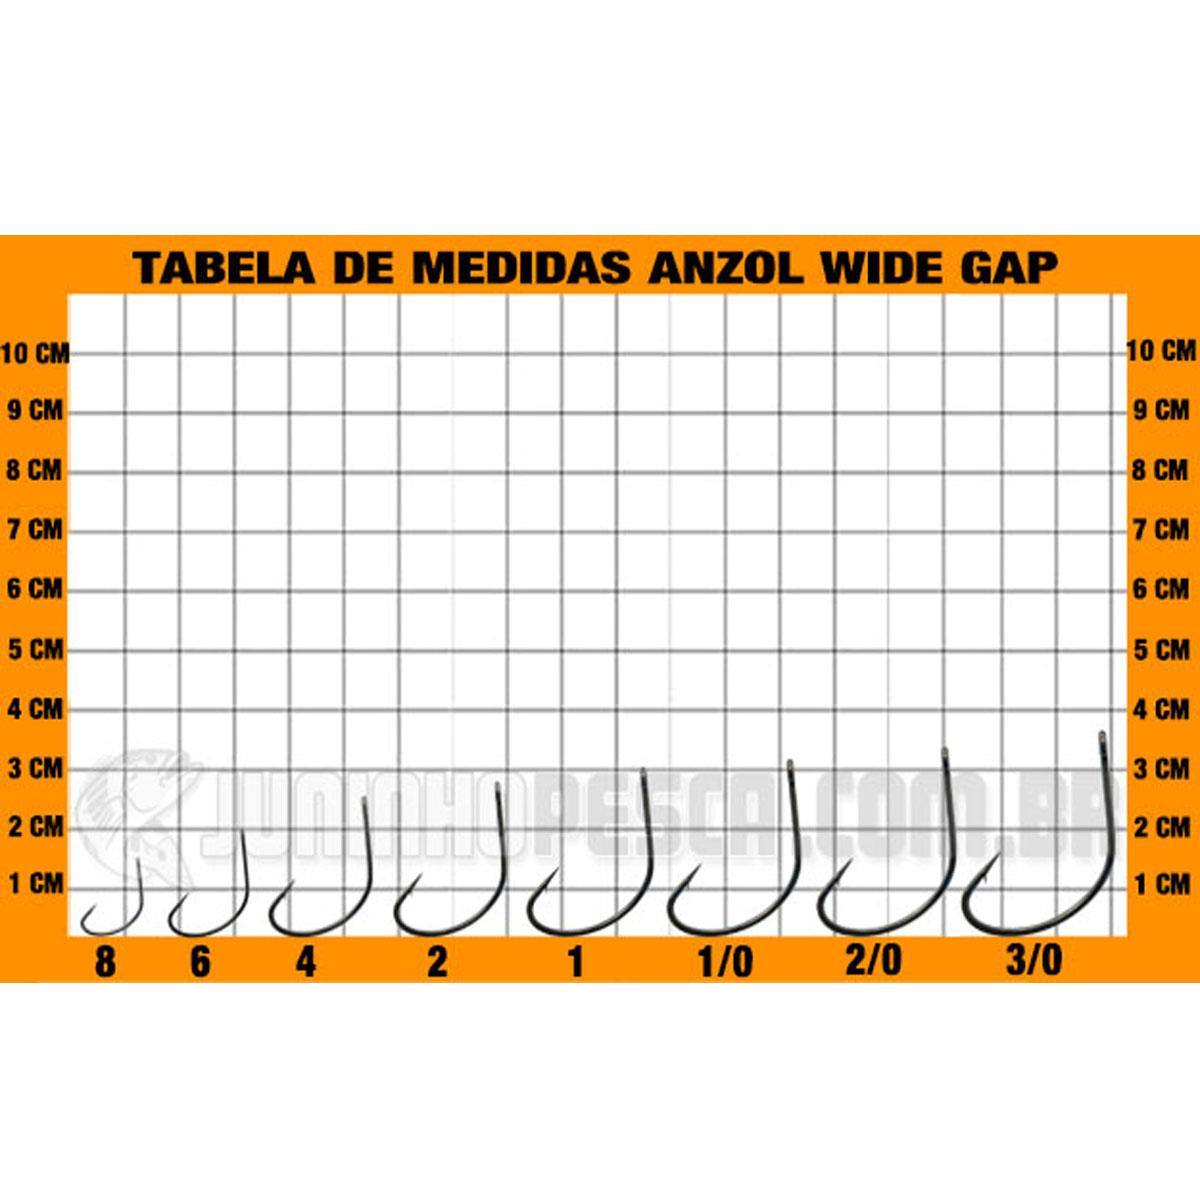 Anzol Pinnacle Wide Gap nº 1/0  - Pró Pesca Shop